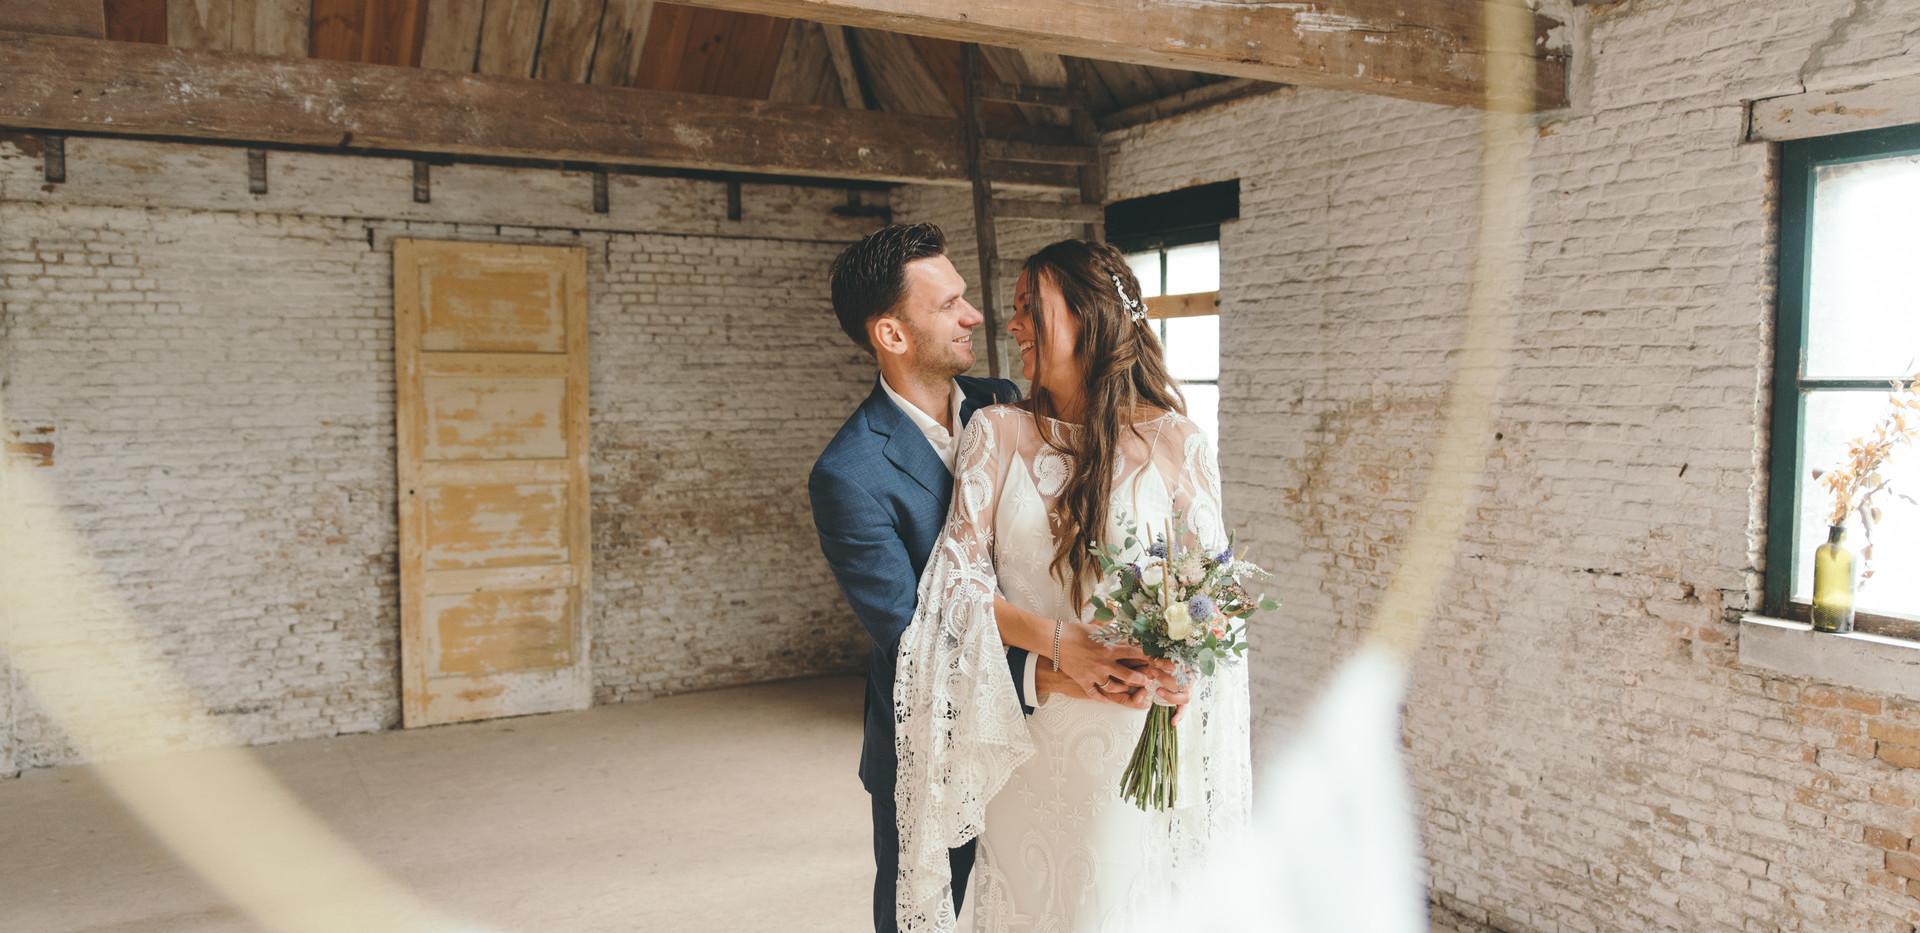 Bruidsfotografie Marieke Timmer.jpg